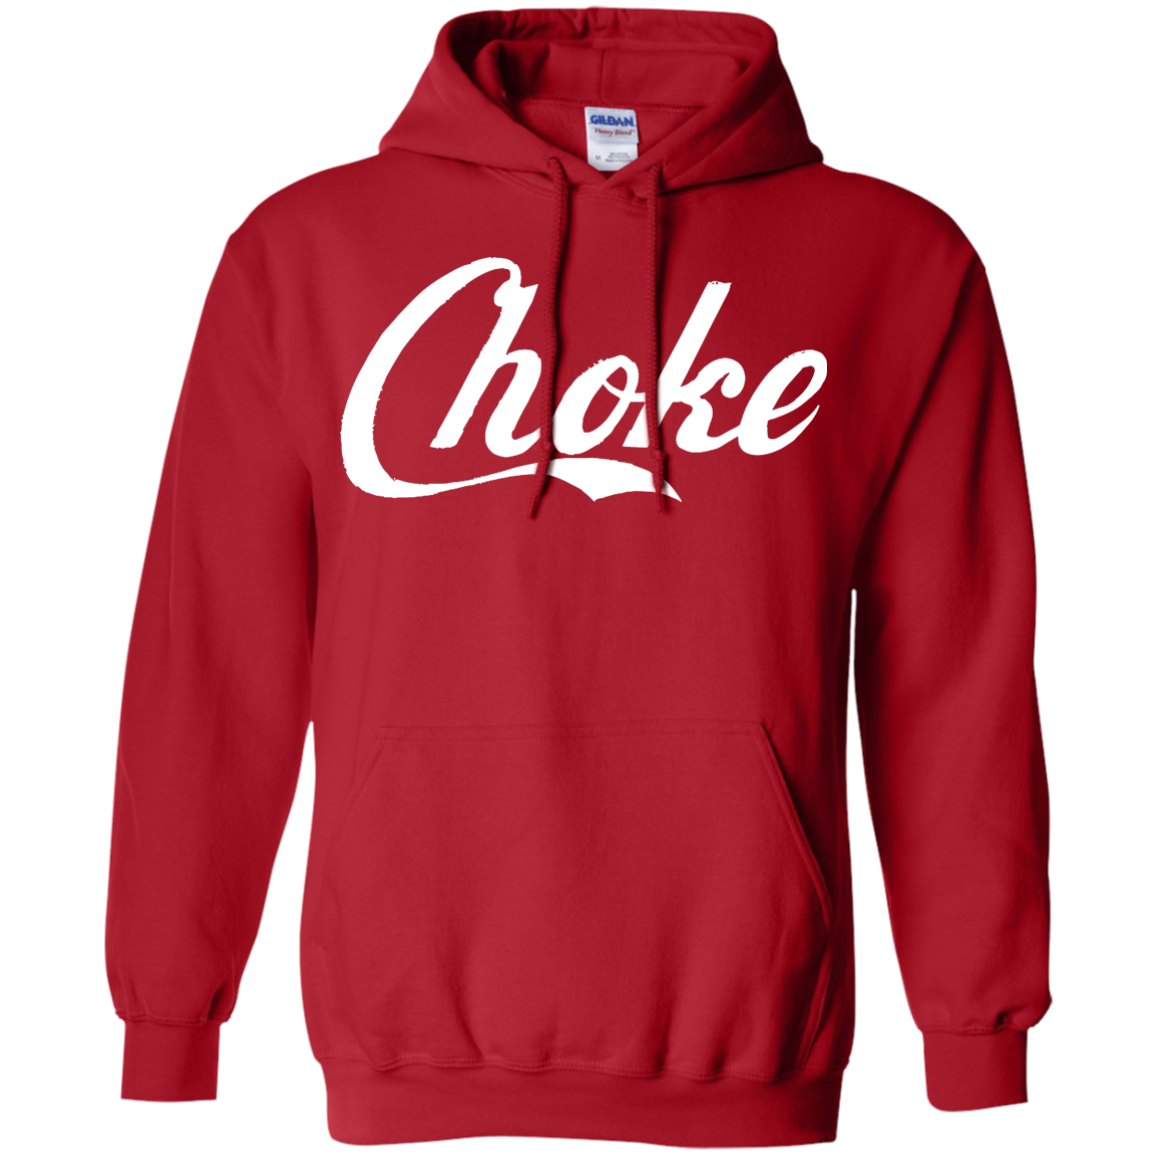 image 1022px Choke Shirt, Choke Logo Coca Cola T Shirts, Hoodies